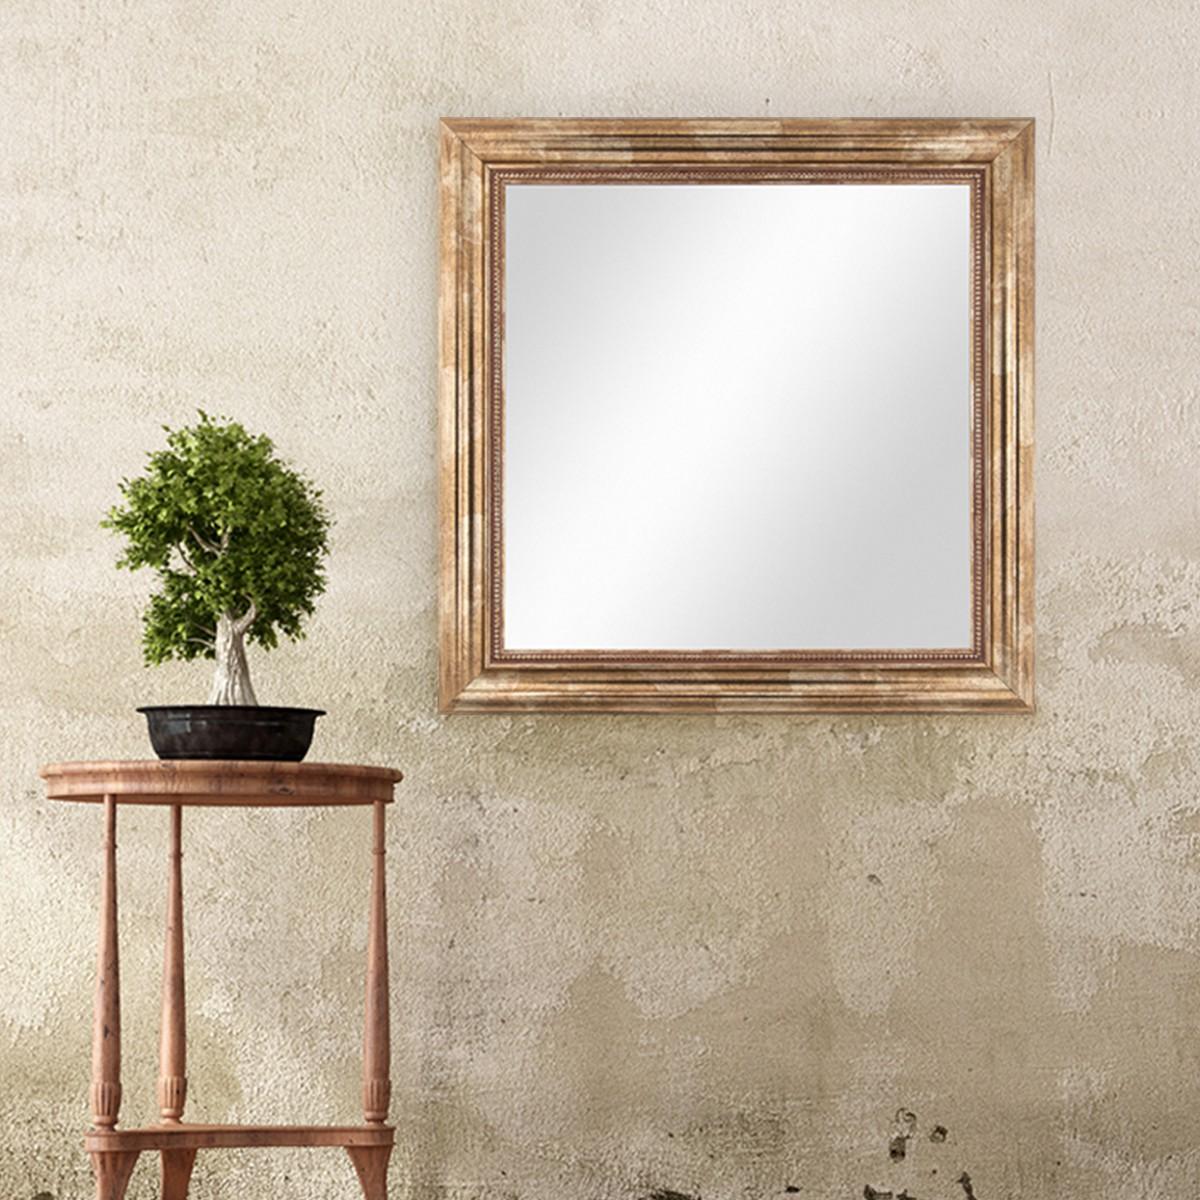 Wand spiegel 60x60 cm im massivholz rahmen barock stil for Spiegel 60x60